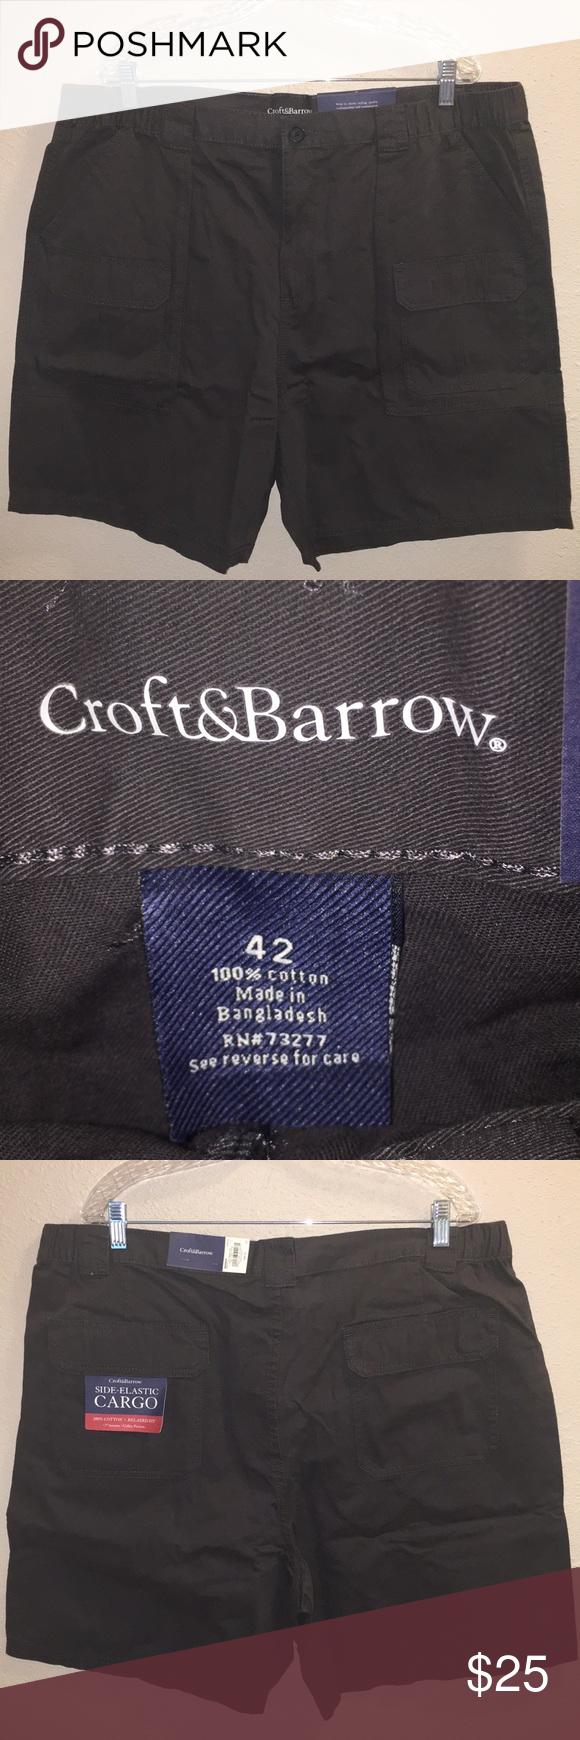 "NWT MENS CROFT/&BARROW SIDE ELASTIC CARGO RELAXED 7/"" INSEAM SHORTS GRAY  SIZE 42"